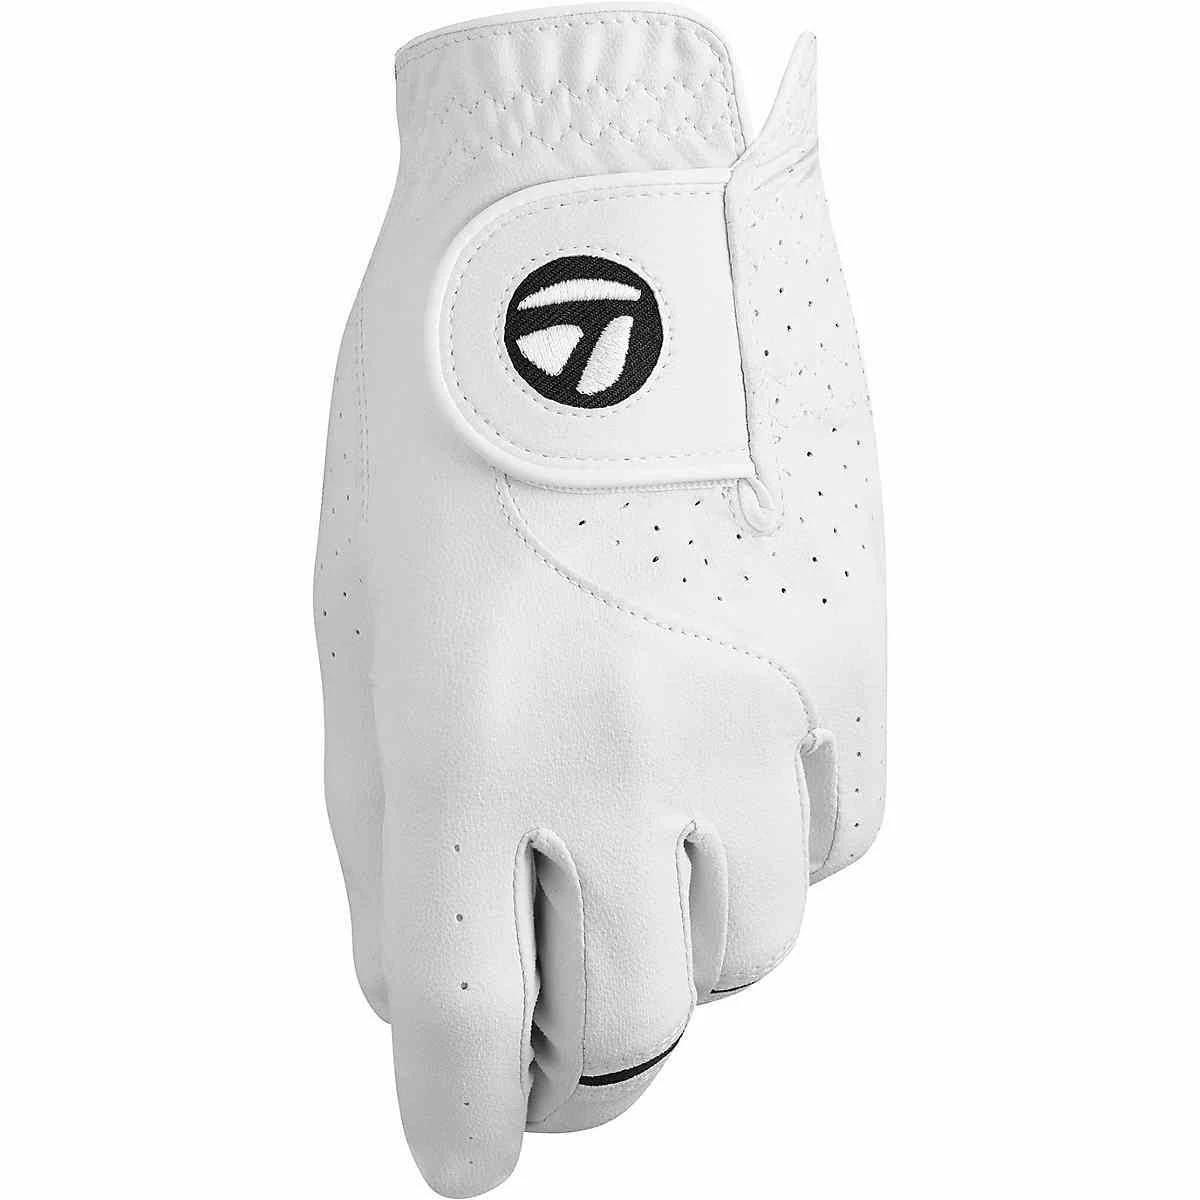 TaylorMade Stratus Tech Left Golf Glove - White XL Cadet